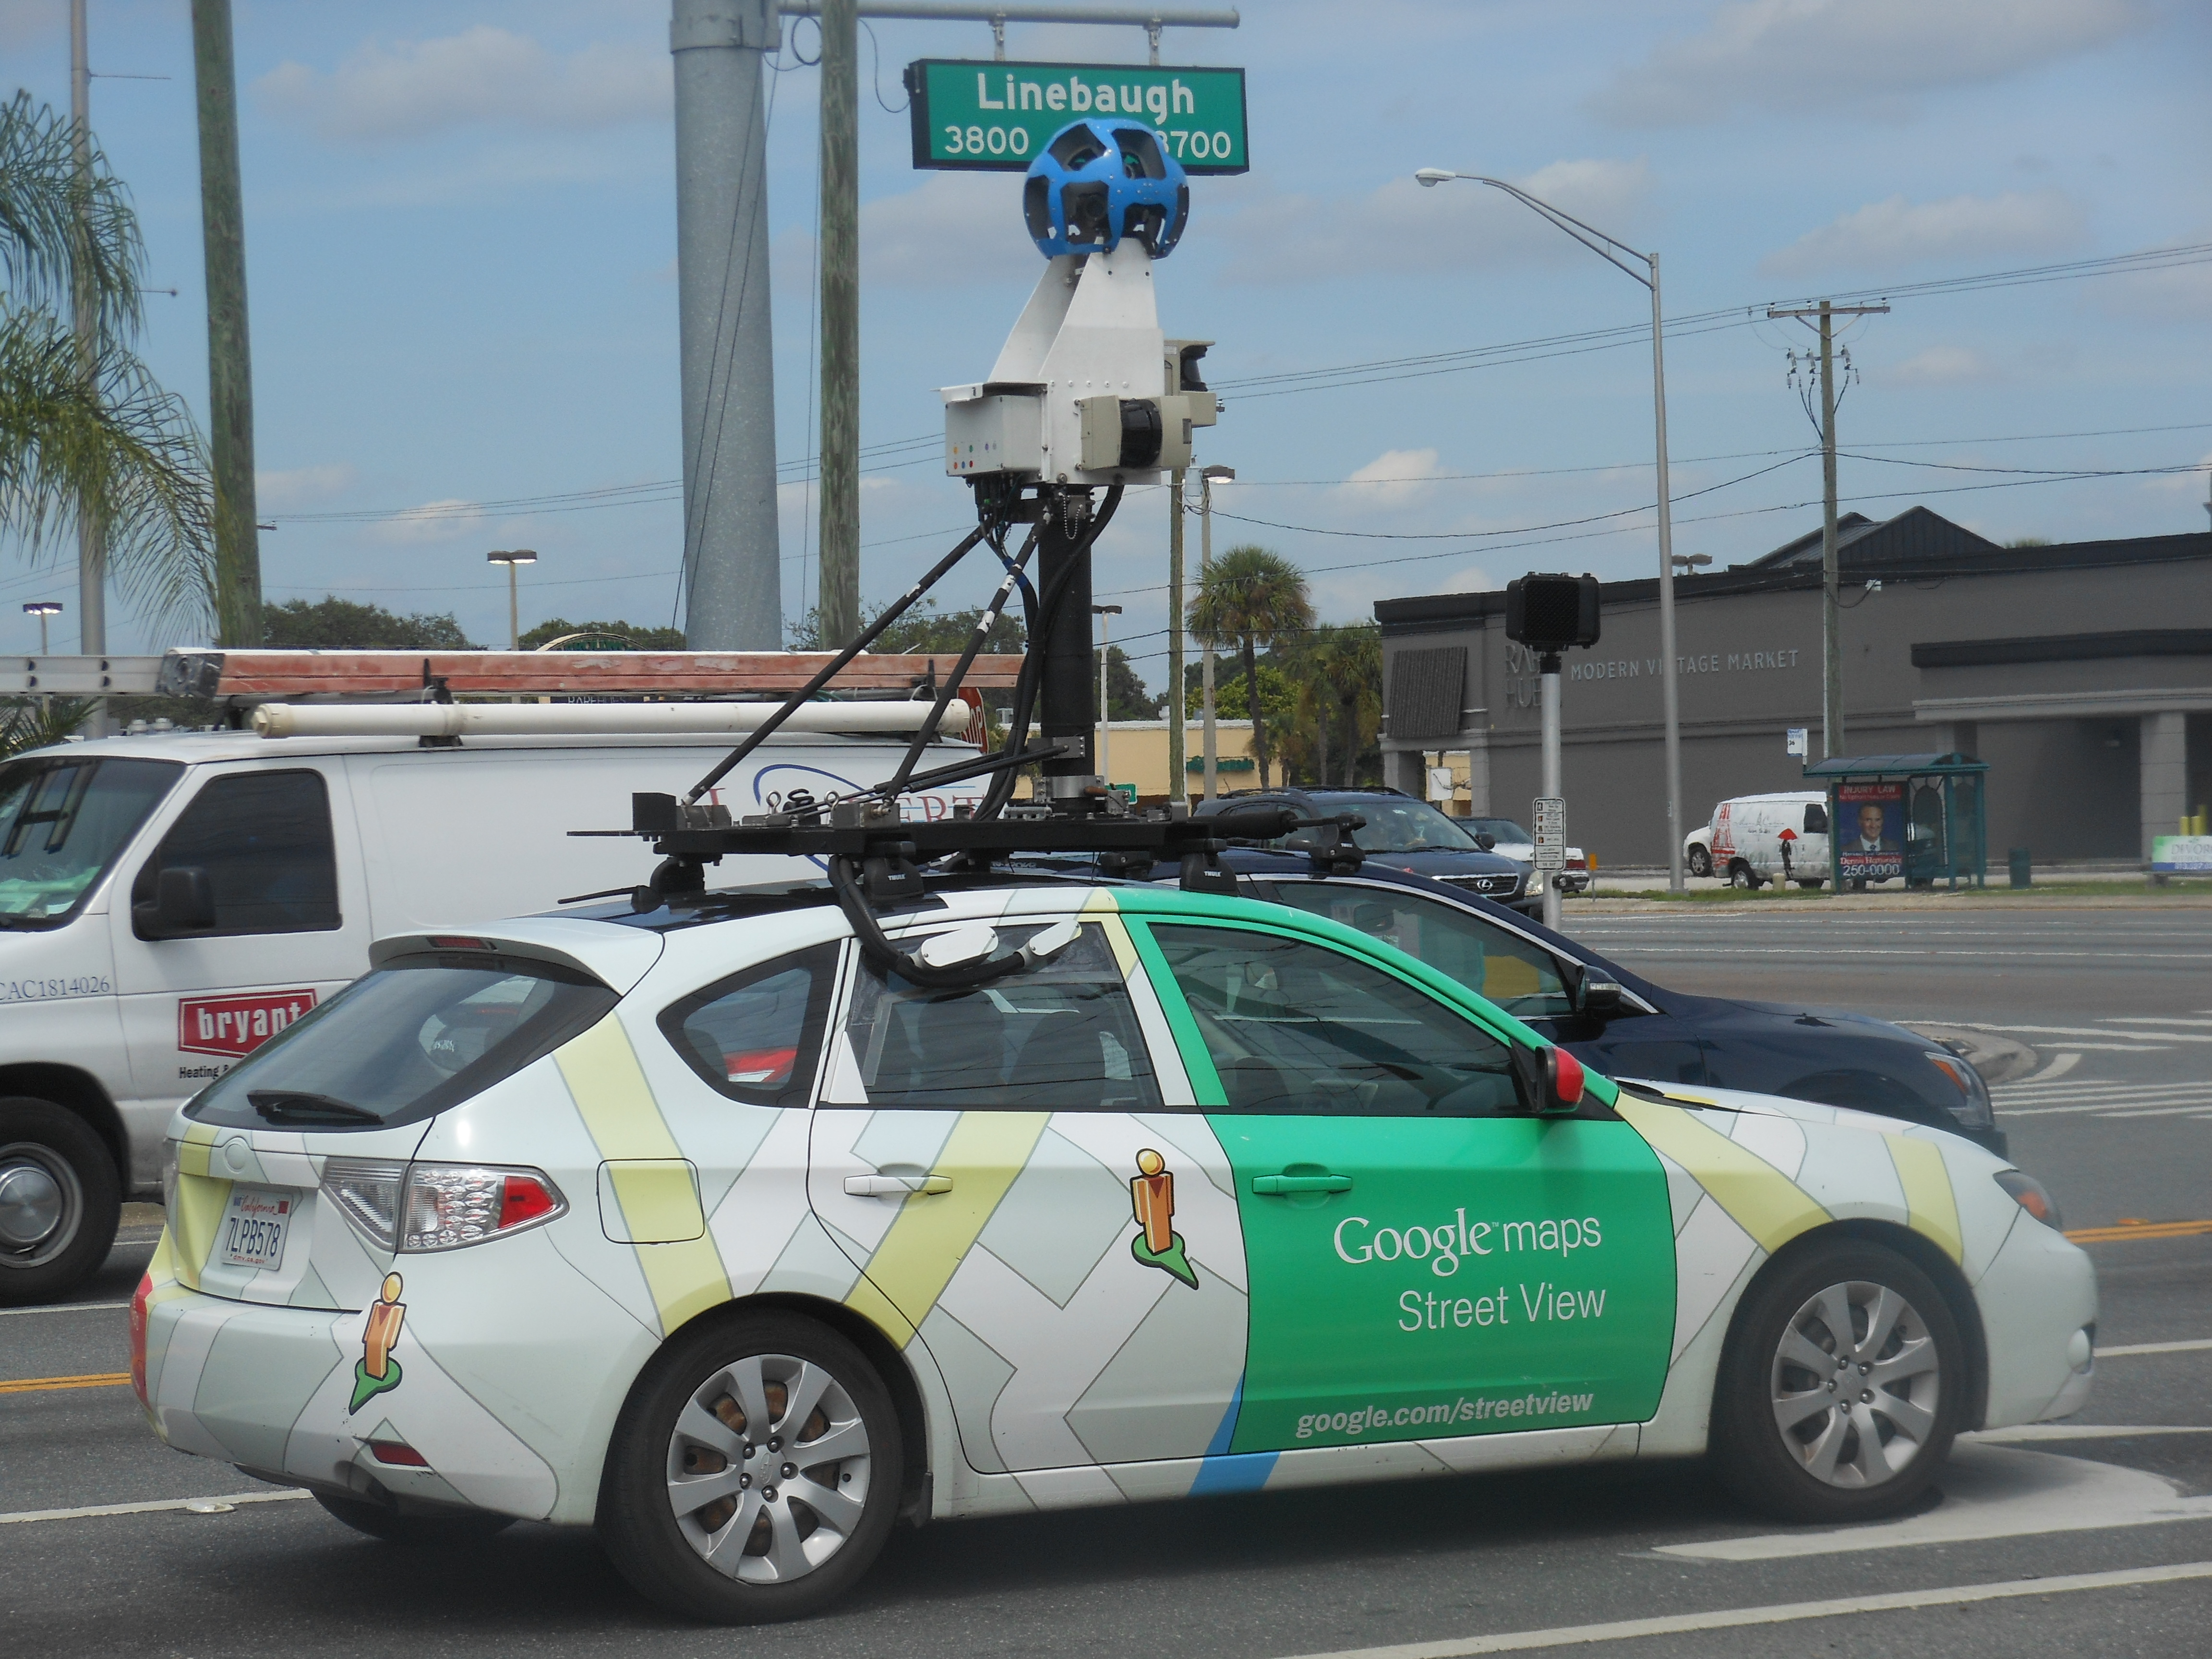 Google Maps Car In Tampa Area | News Blog - Google Maps Tampa Florida